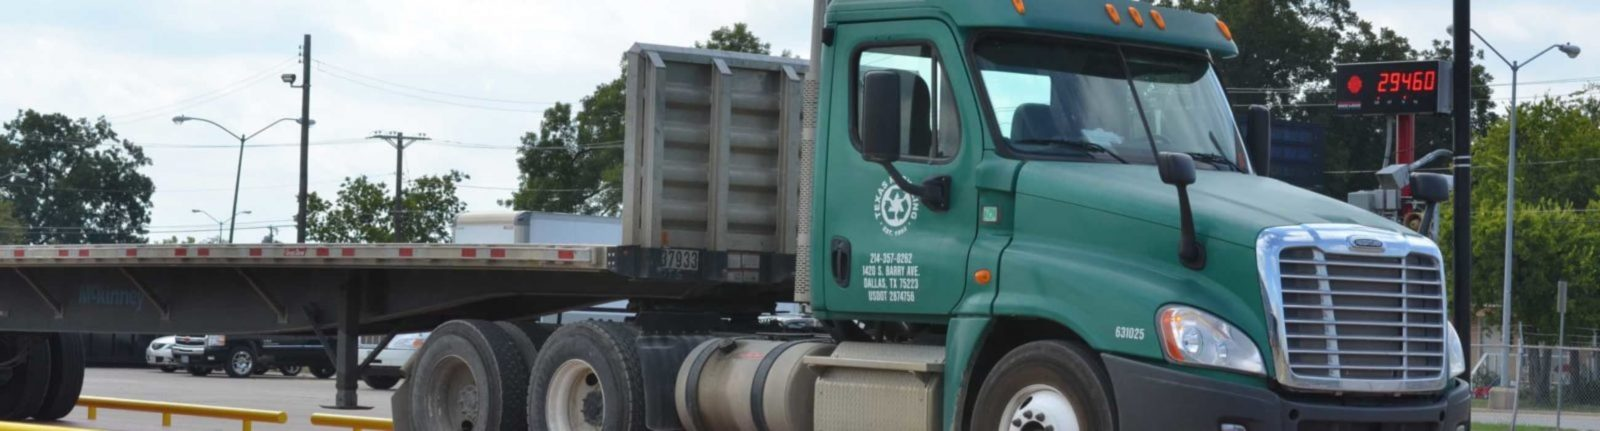 Metal-Recycling-Dallas_TxR-Slider-Truck-Scale